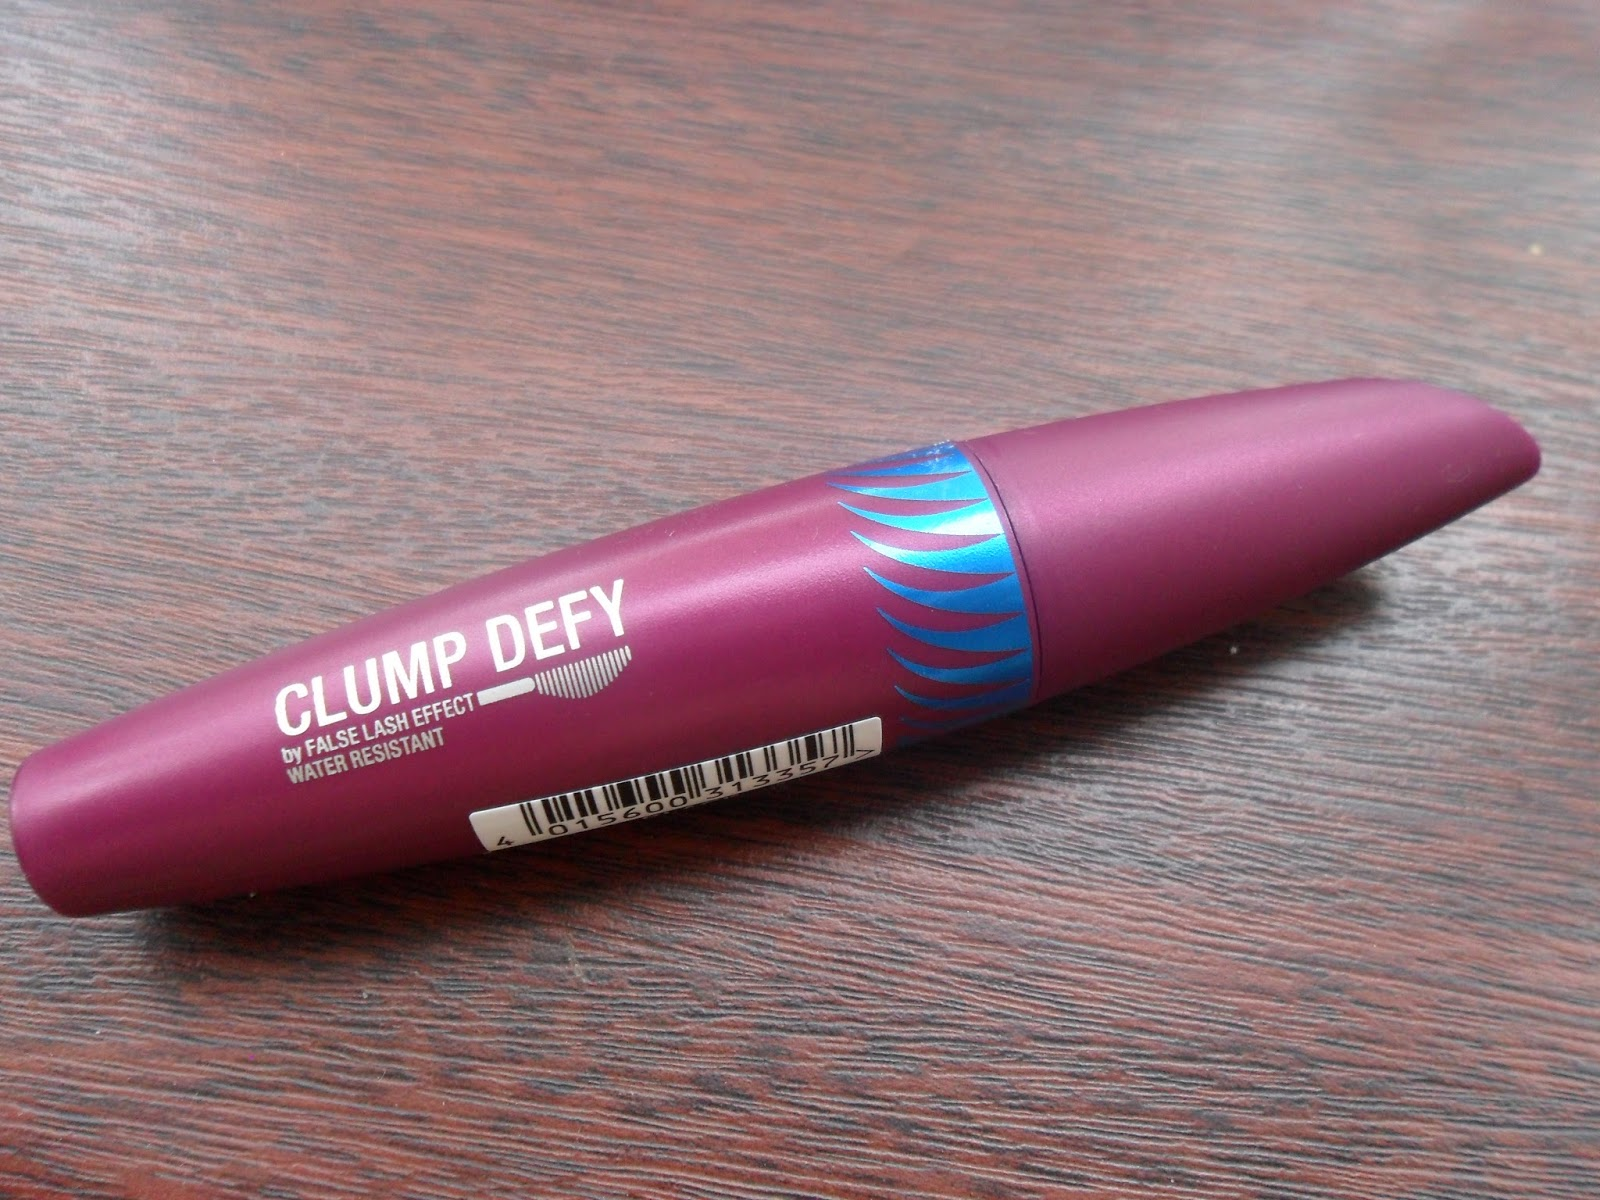 Max Factor Clump Defy Mascara